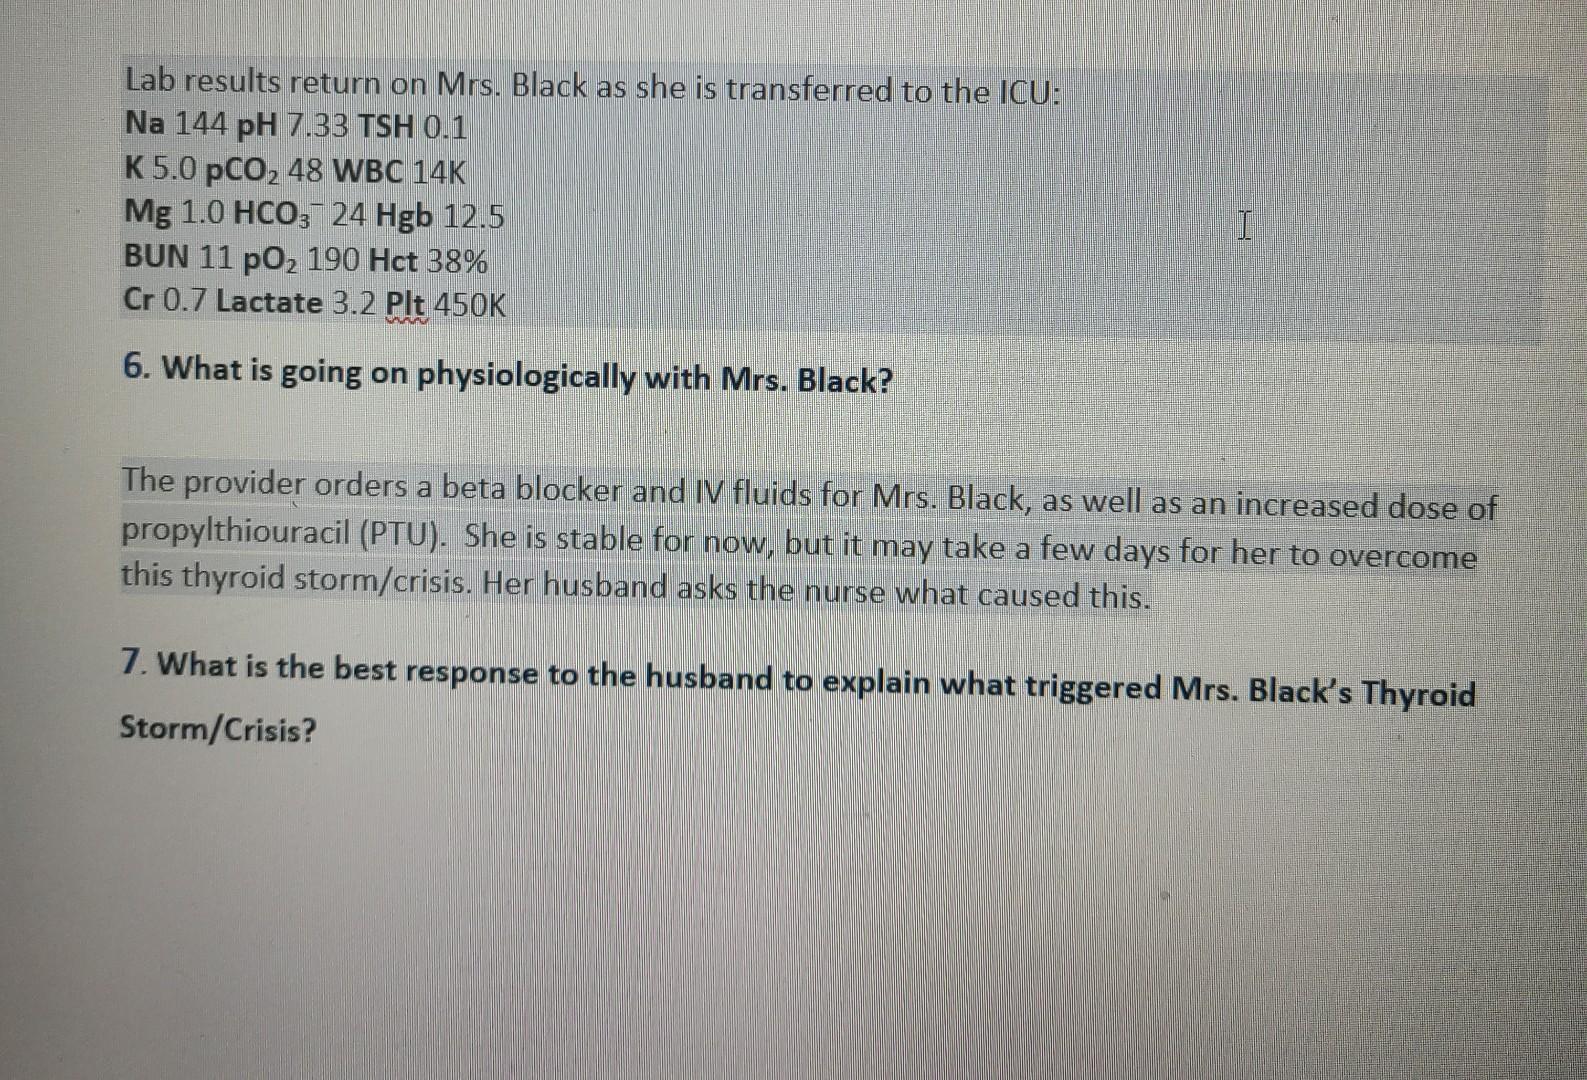 Lab results return on Mrs. Black as she is transferred to the ICU: Na 144 pH 7.33 TSH 0.1 K 5.0 pCO, 48 WBC 14K Mg 1.0 HCO3-